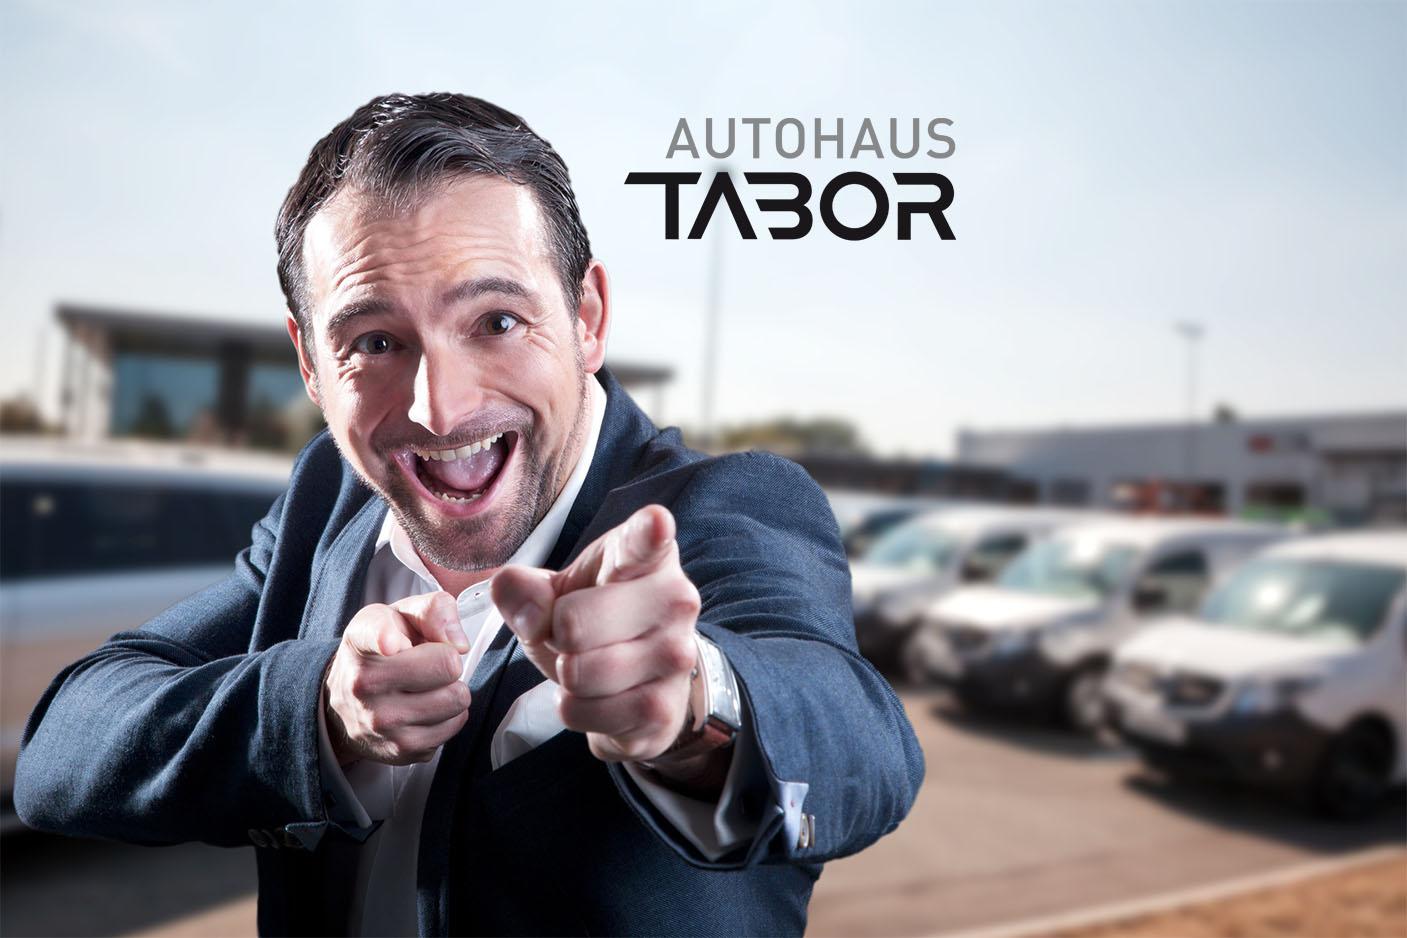 Automobilverkäufer Autohaus Tabor